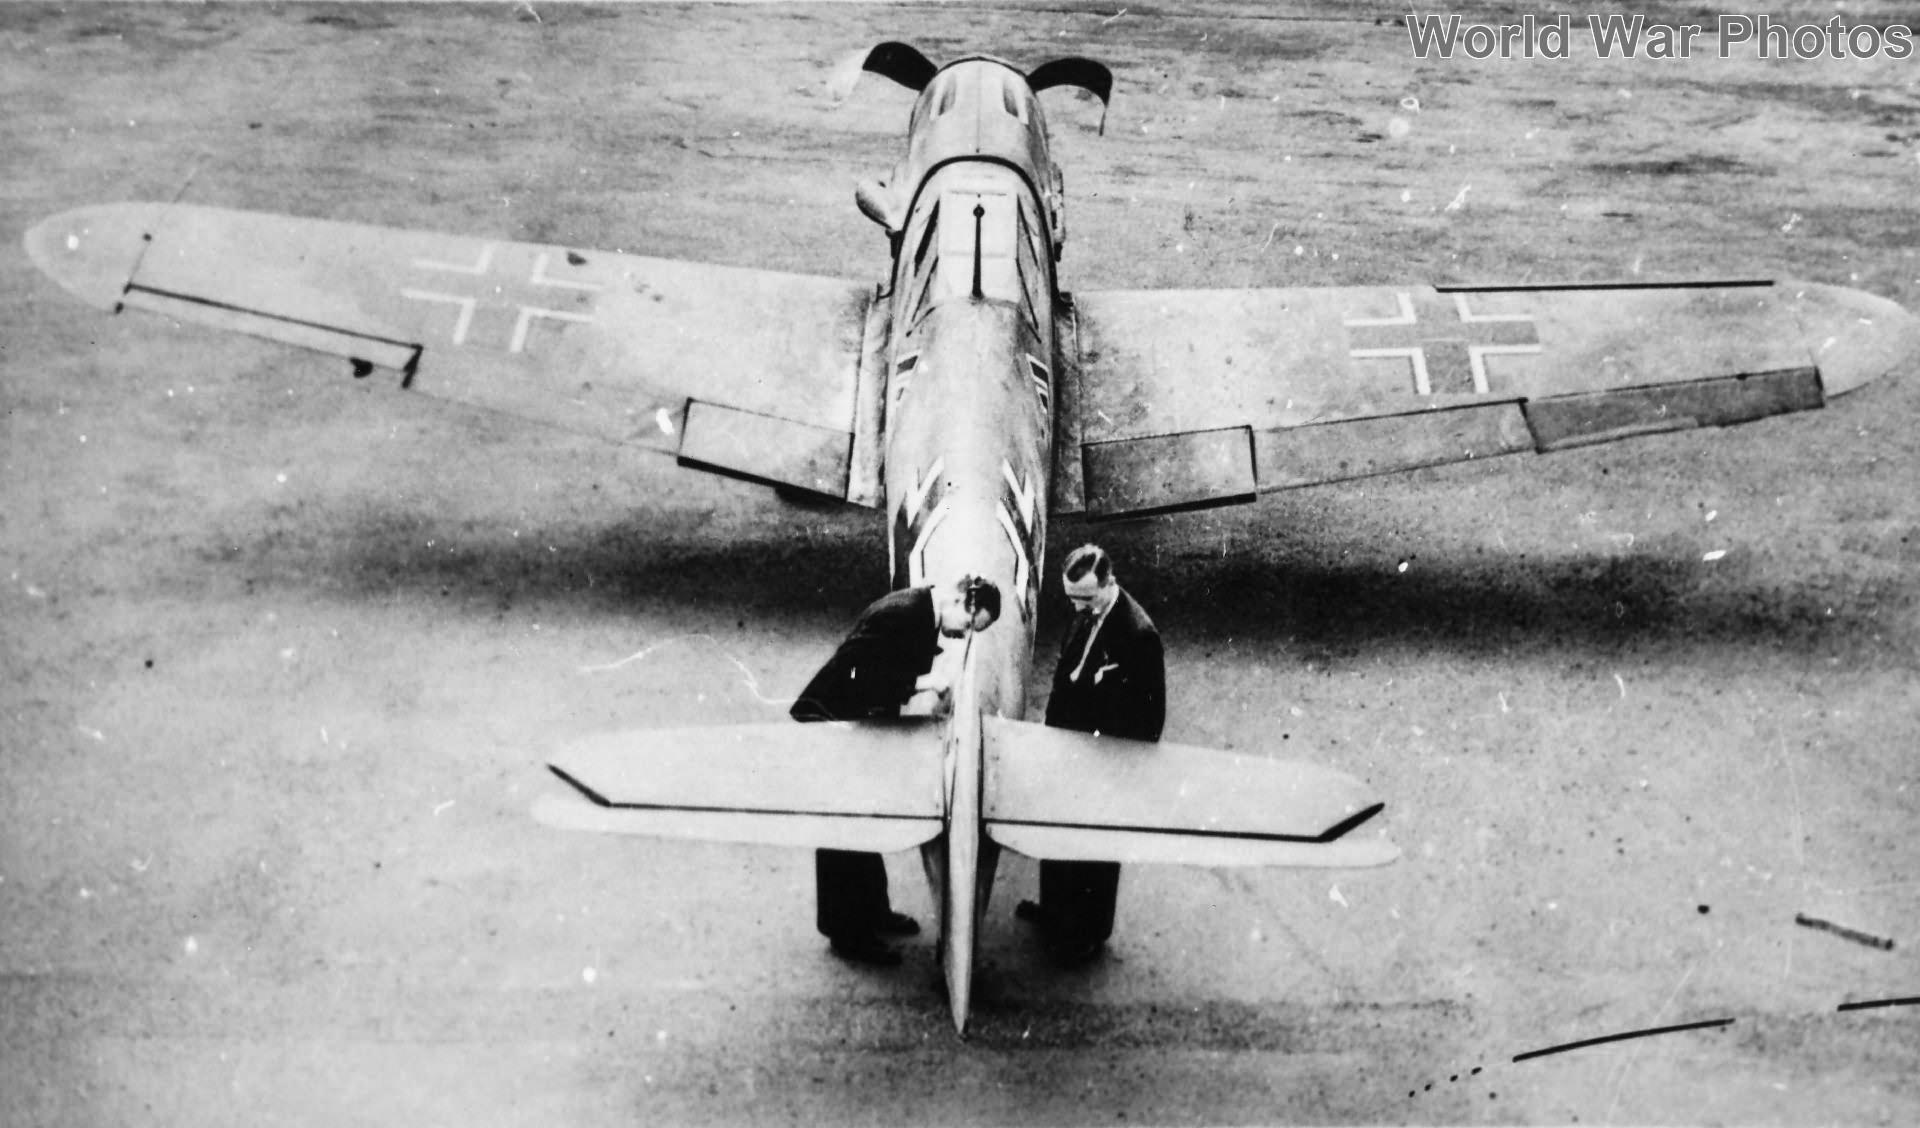 Captured Me109F-2 W.Nr. 12764 ex I/JG 26, 1941